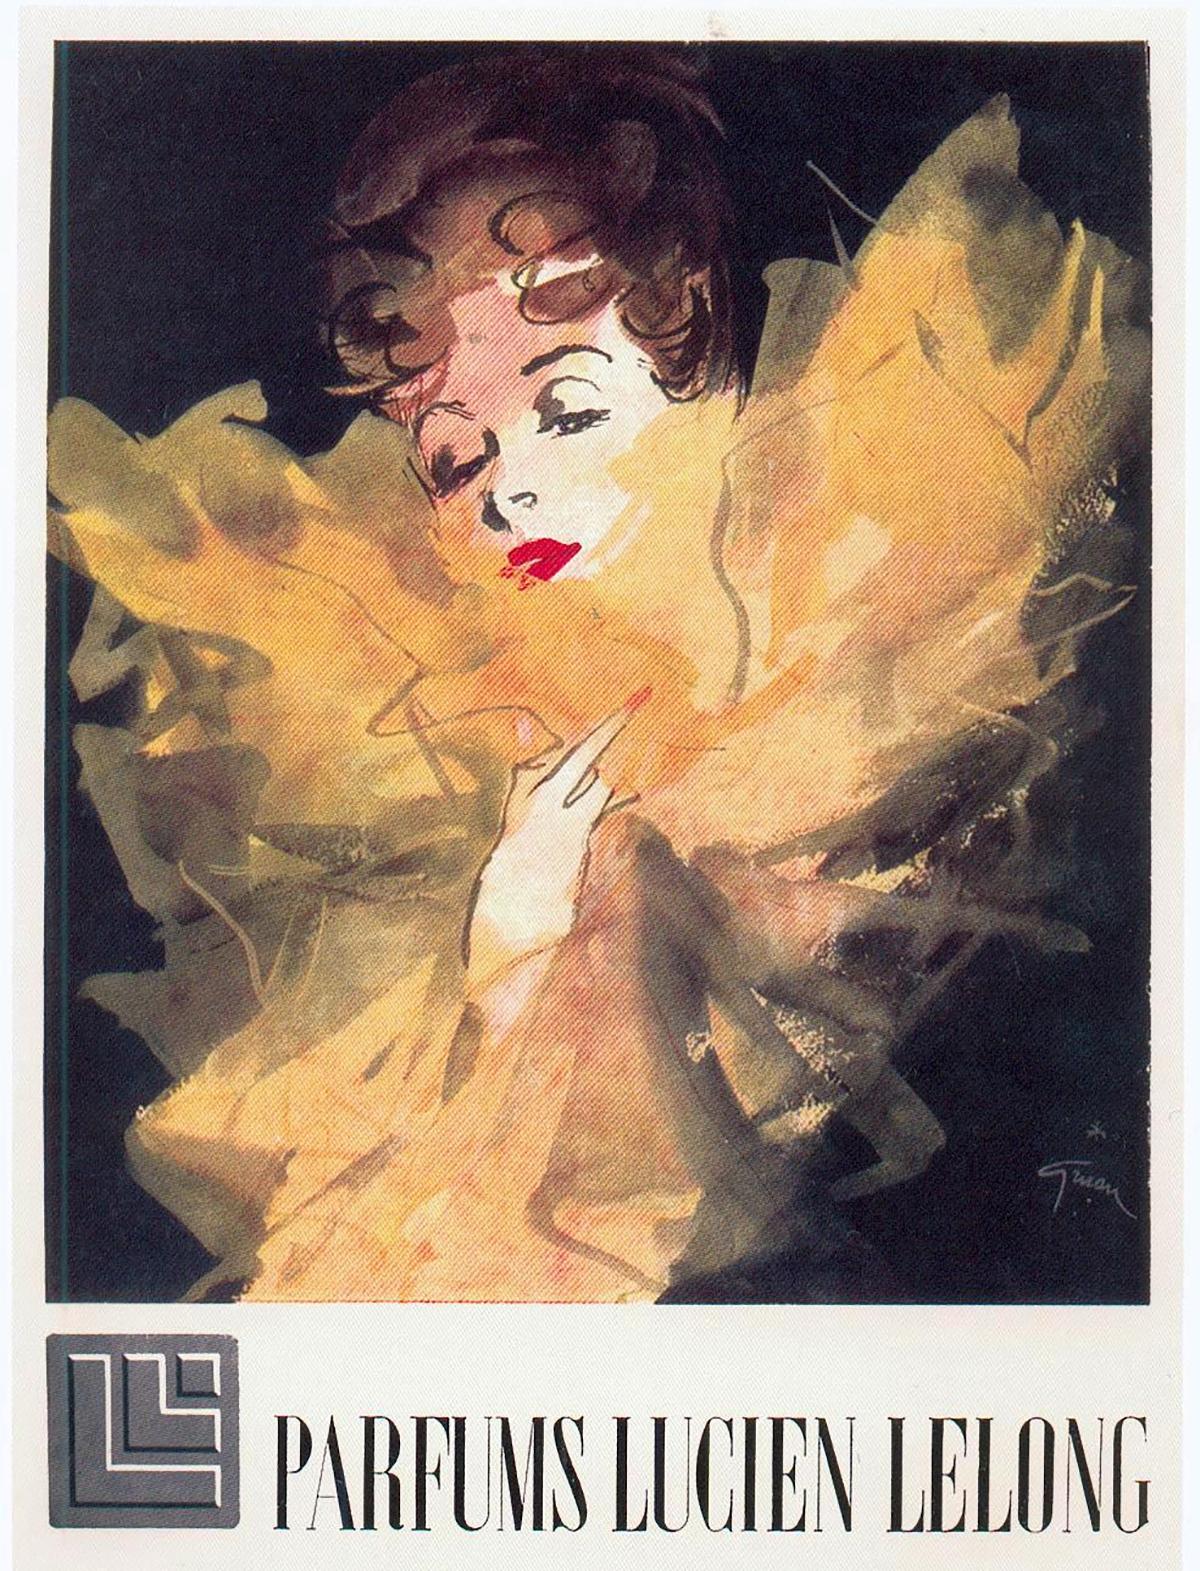 Lucien Lelong Parfum ad, 1930s